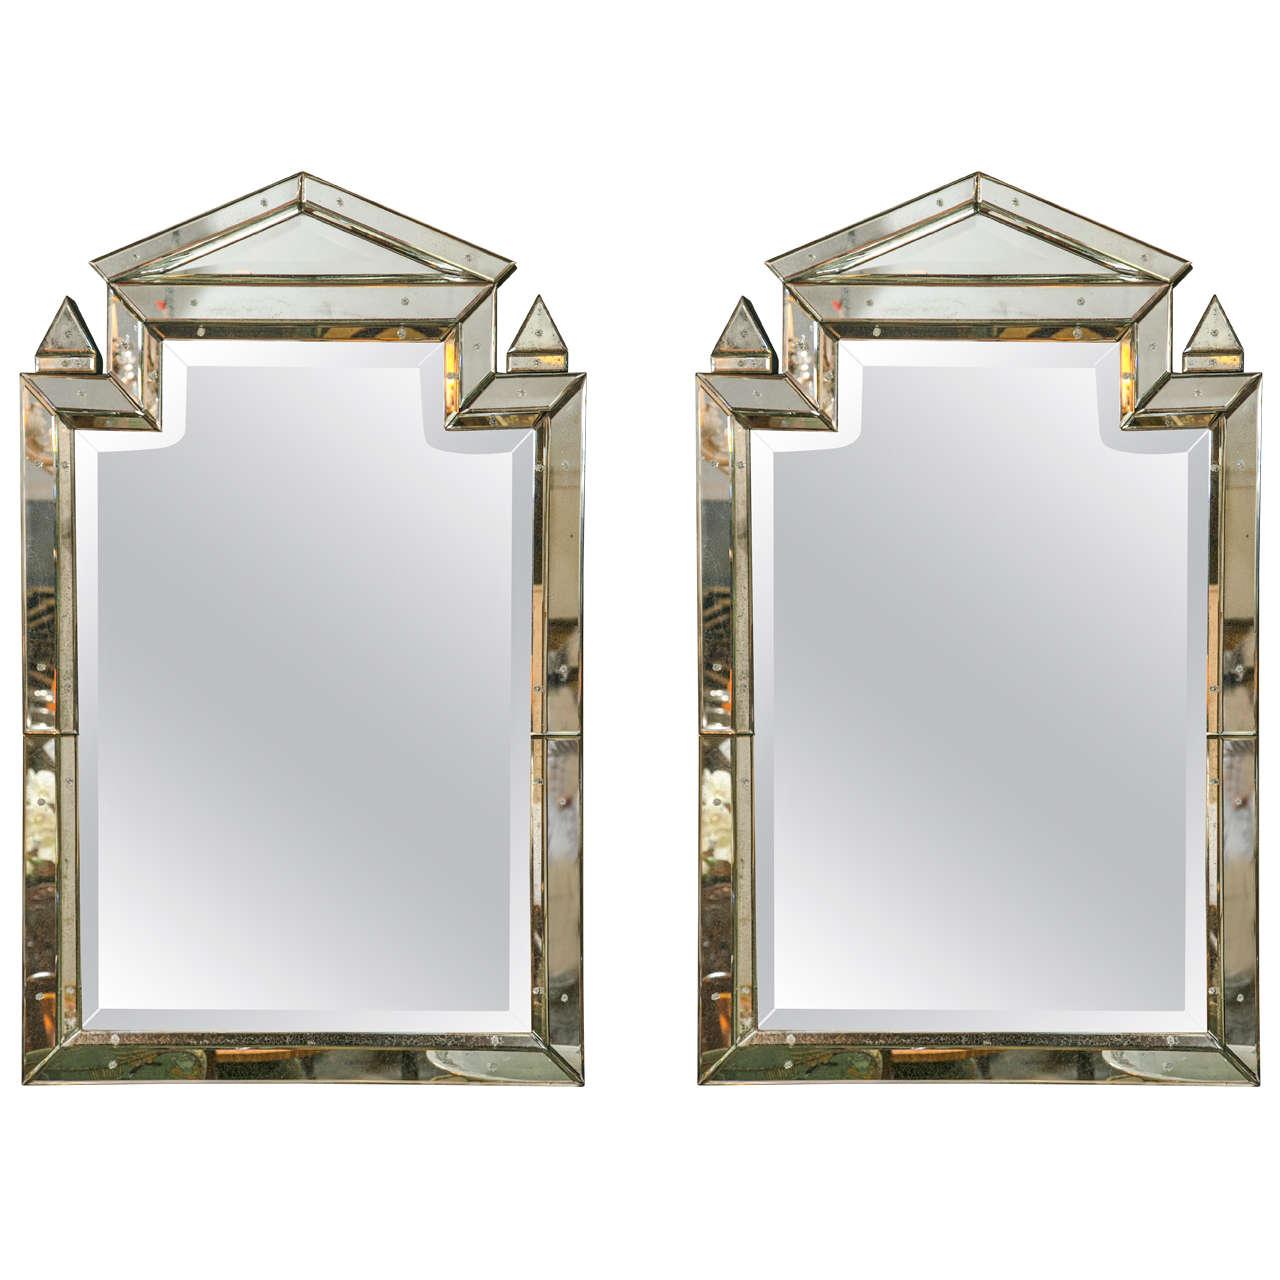 Pair of Piedmont Hollywood Regency Style Venetian Mirrors